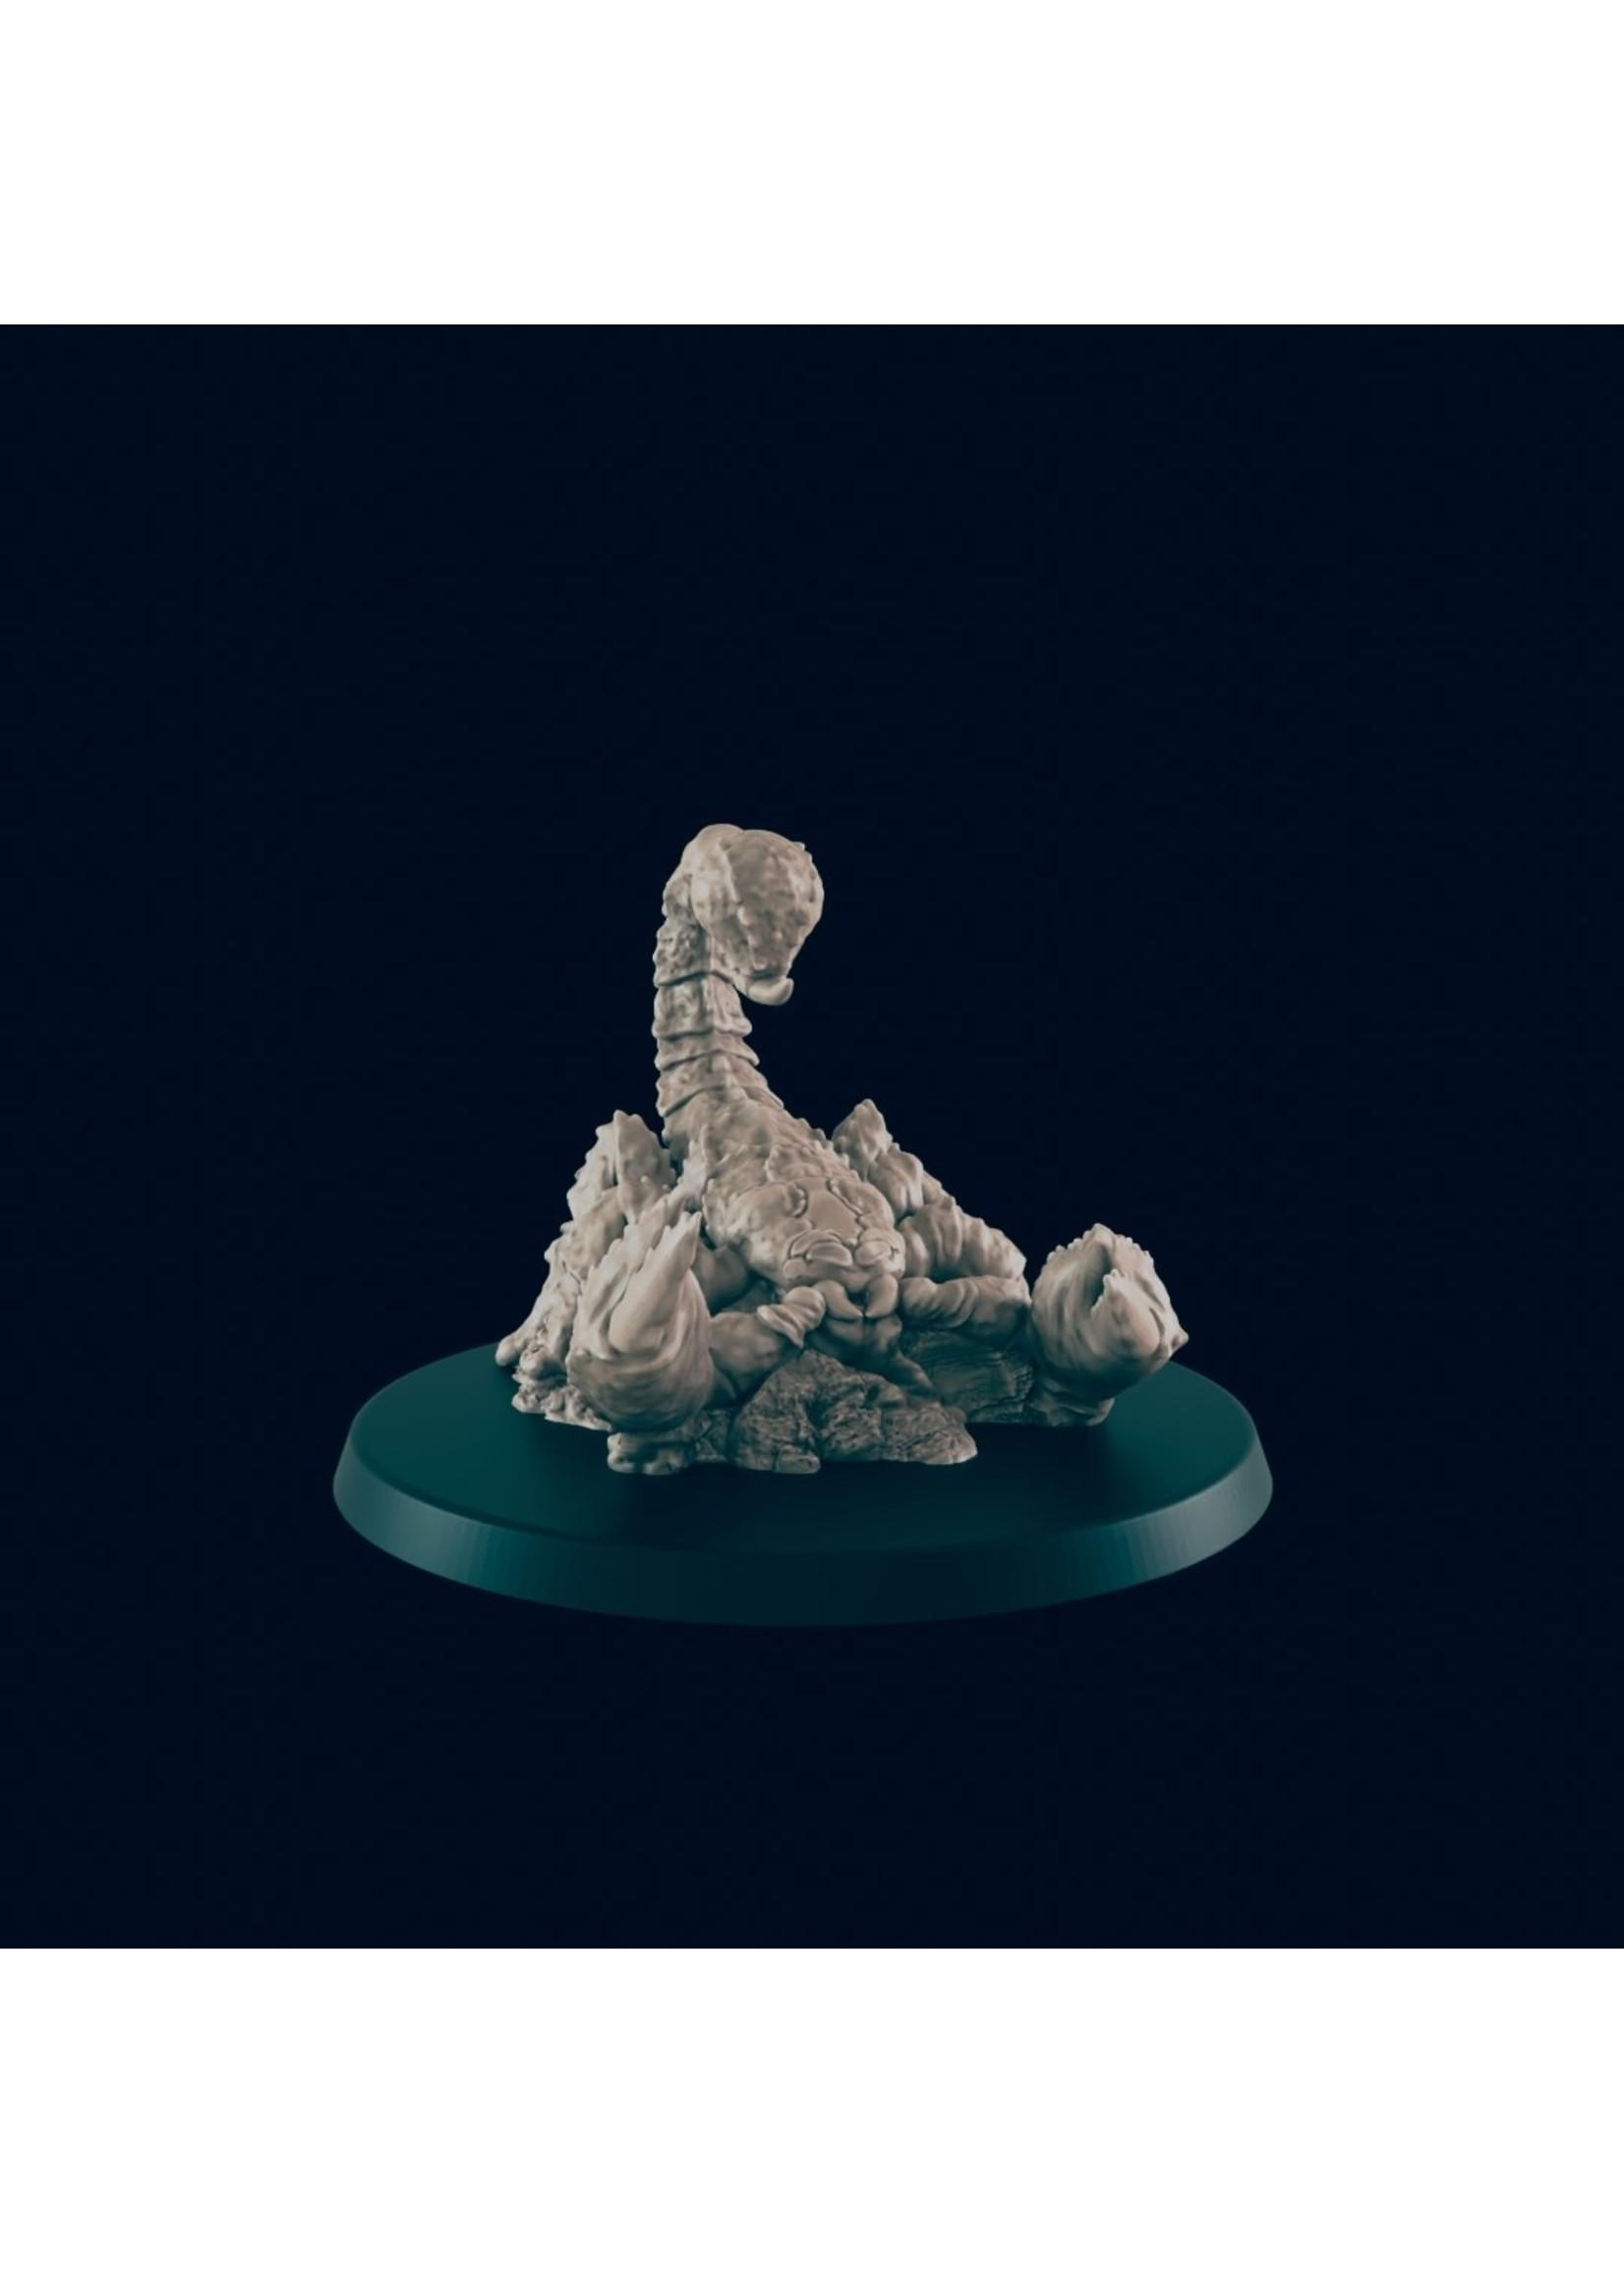 3D Printed Miniature - Giant Scorpion - Dungeons & Dragons - Beasts and Baddies KS